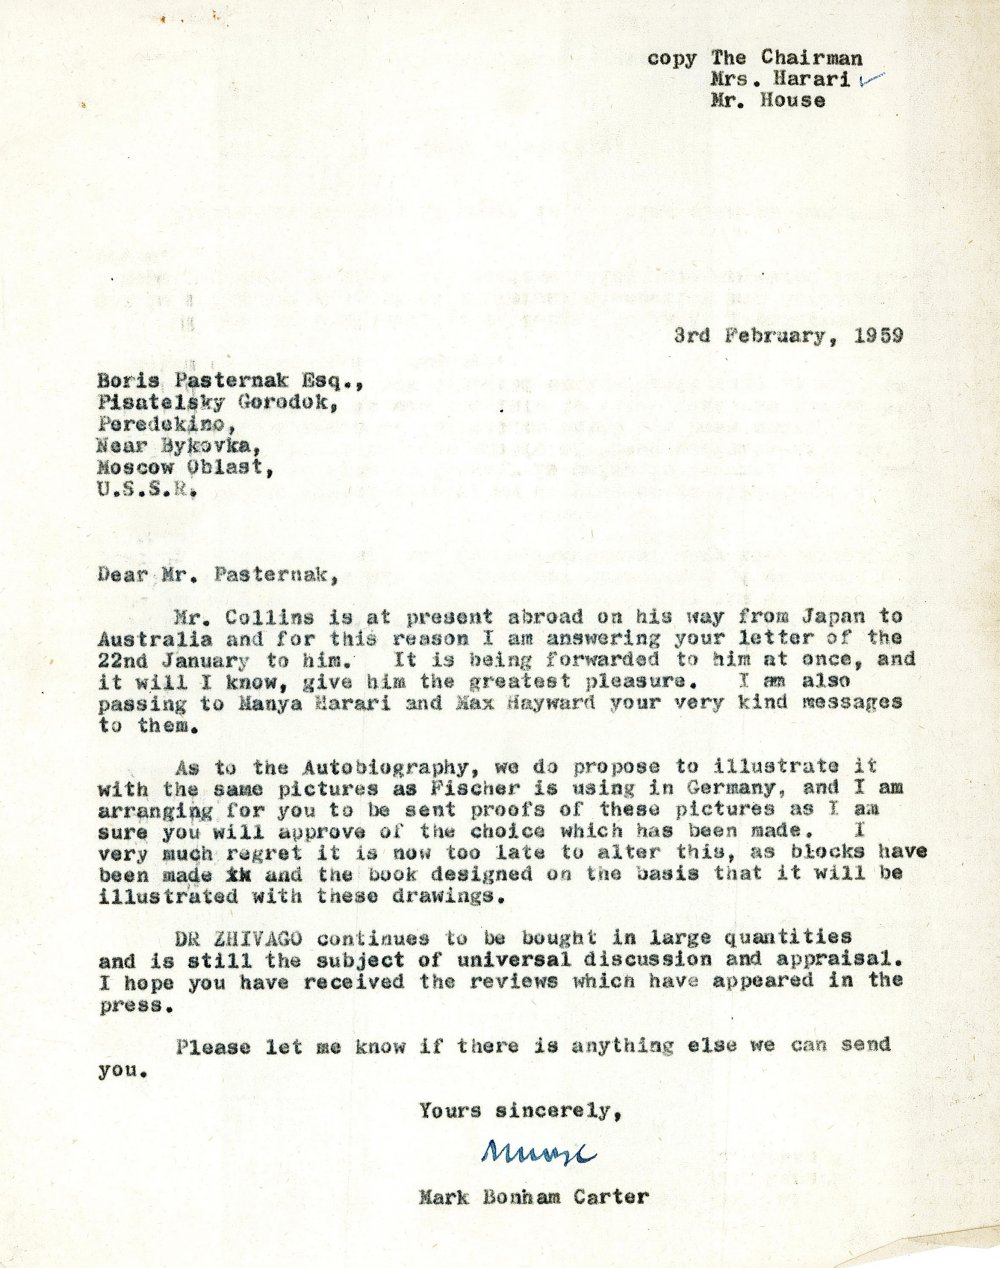 Letter from Collins editor Mark Bonham Carter to Boris Pasternak